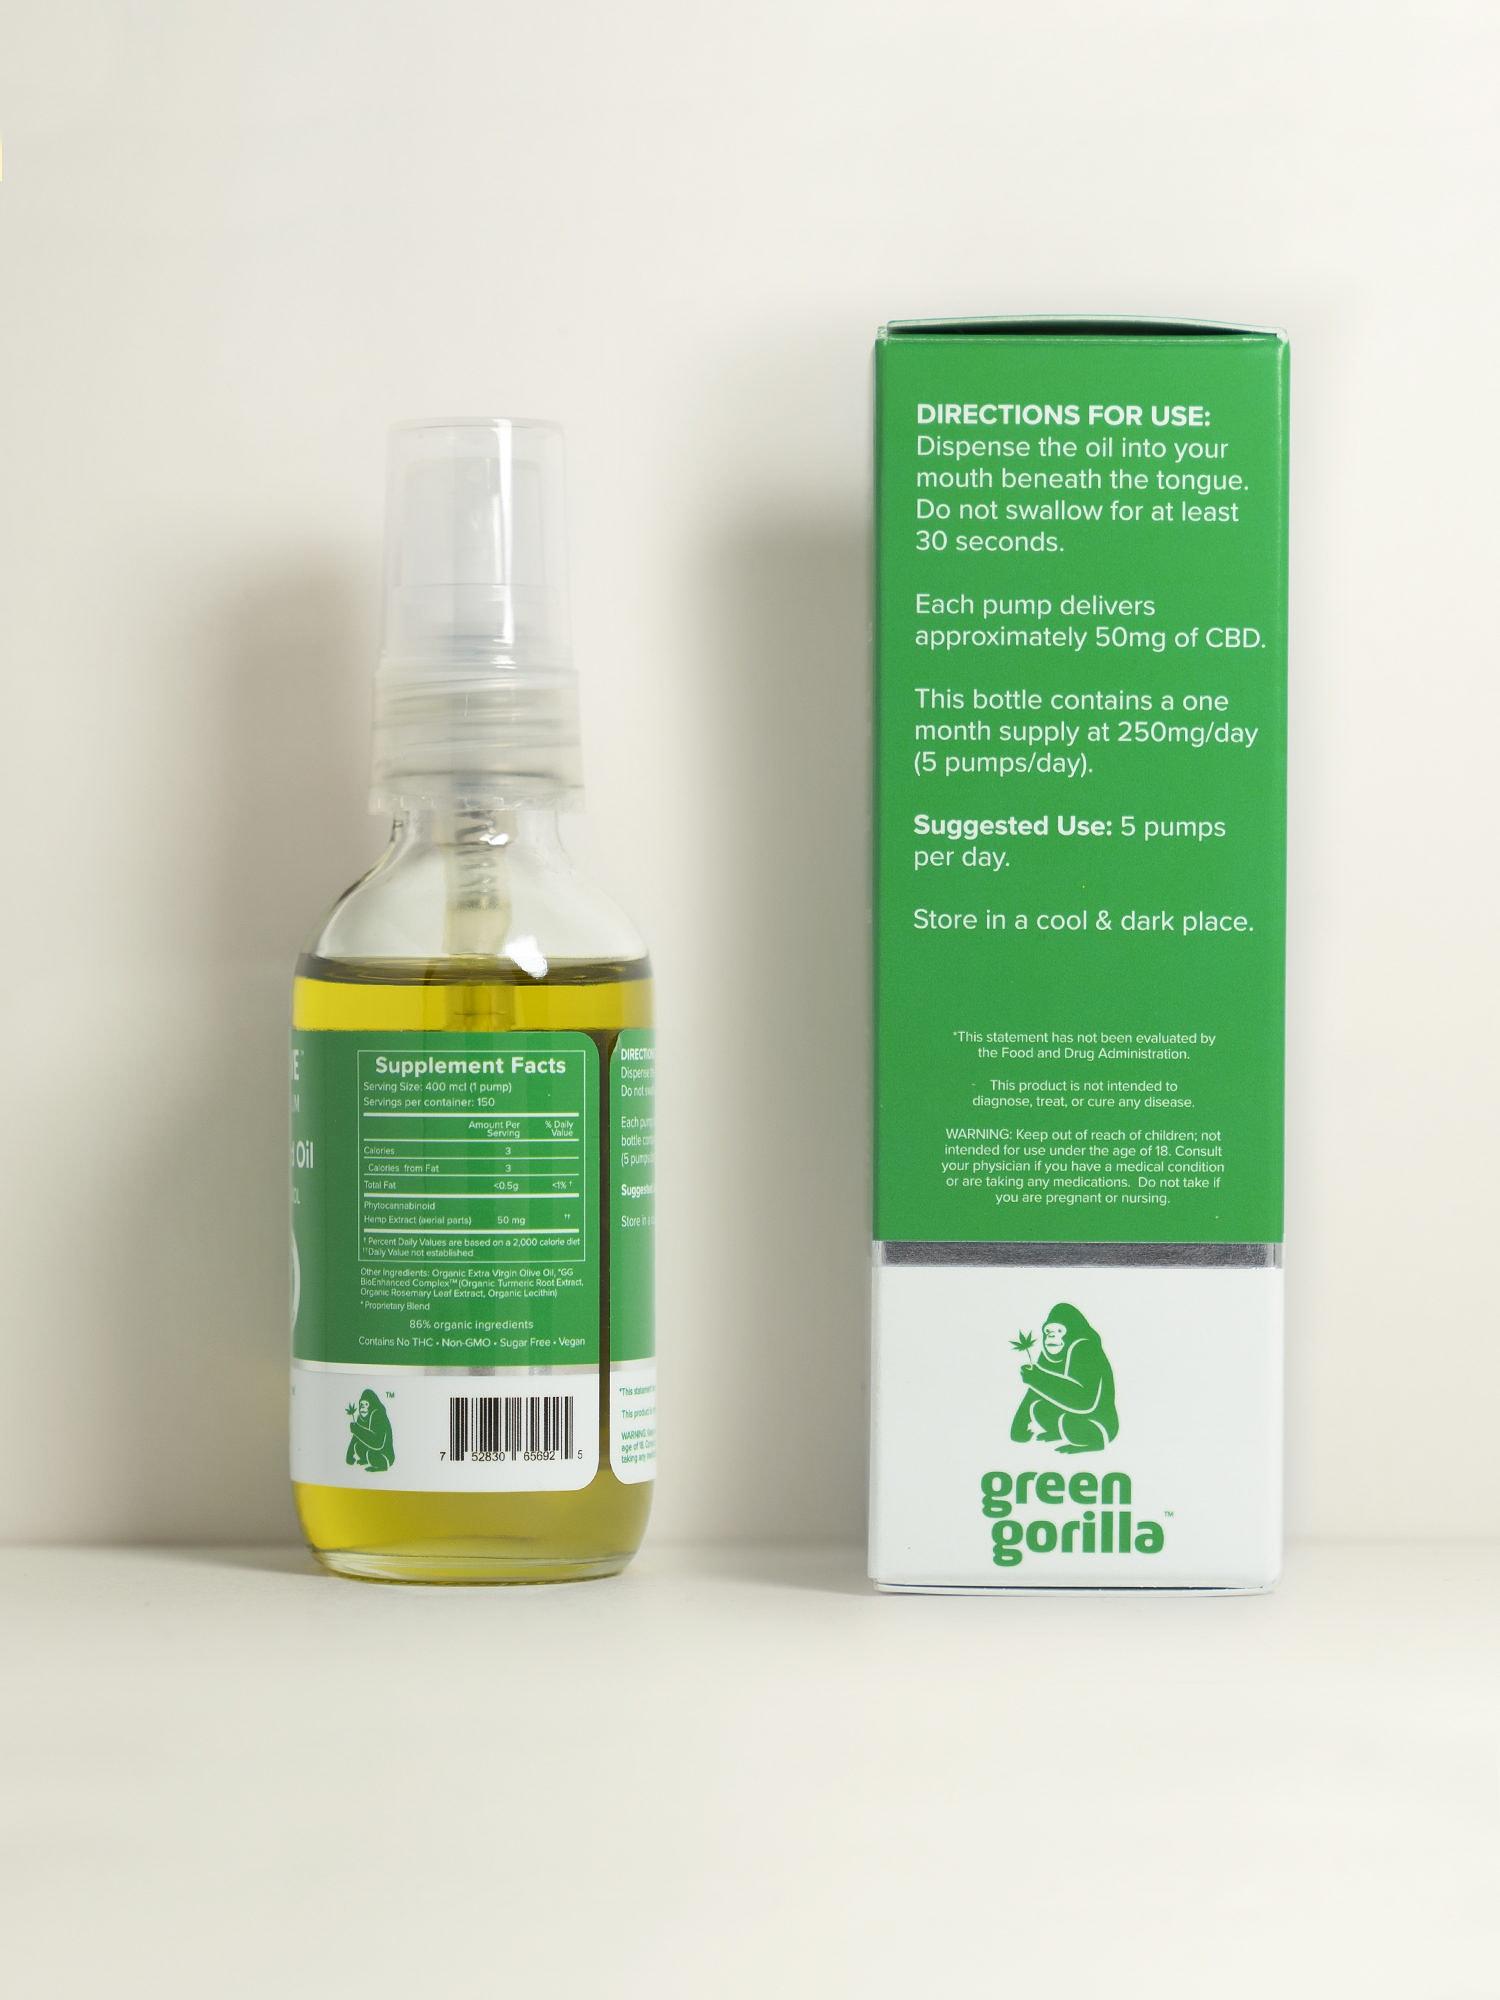 Buy USDA Certified Organic Pure Cannabidiol Oil - 7500mg